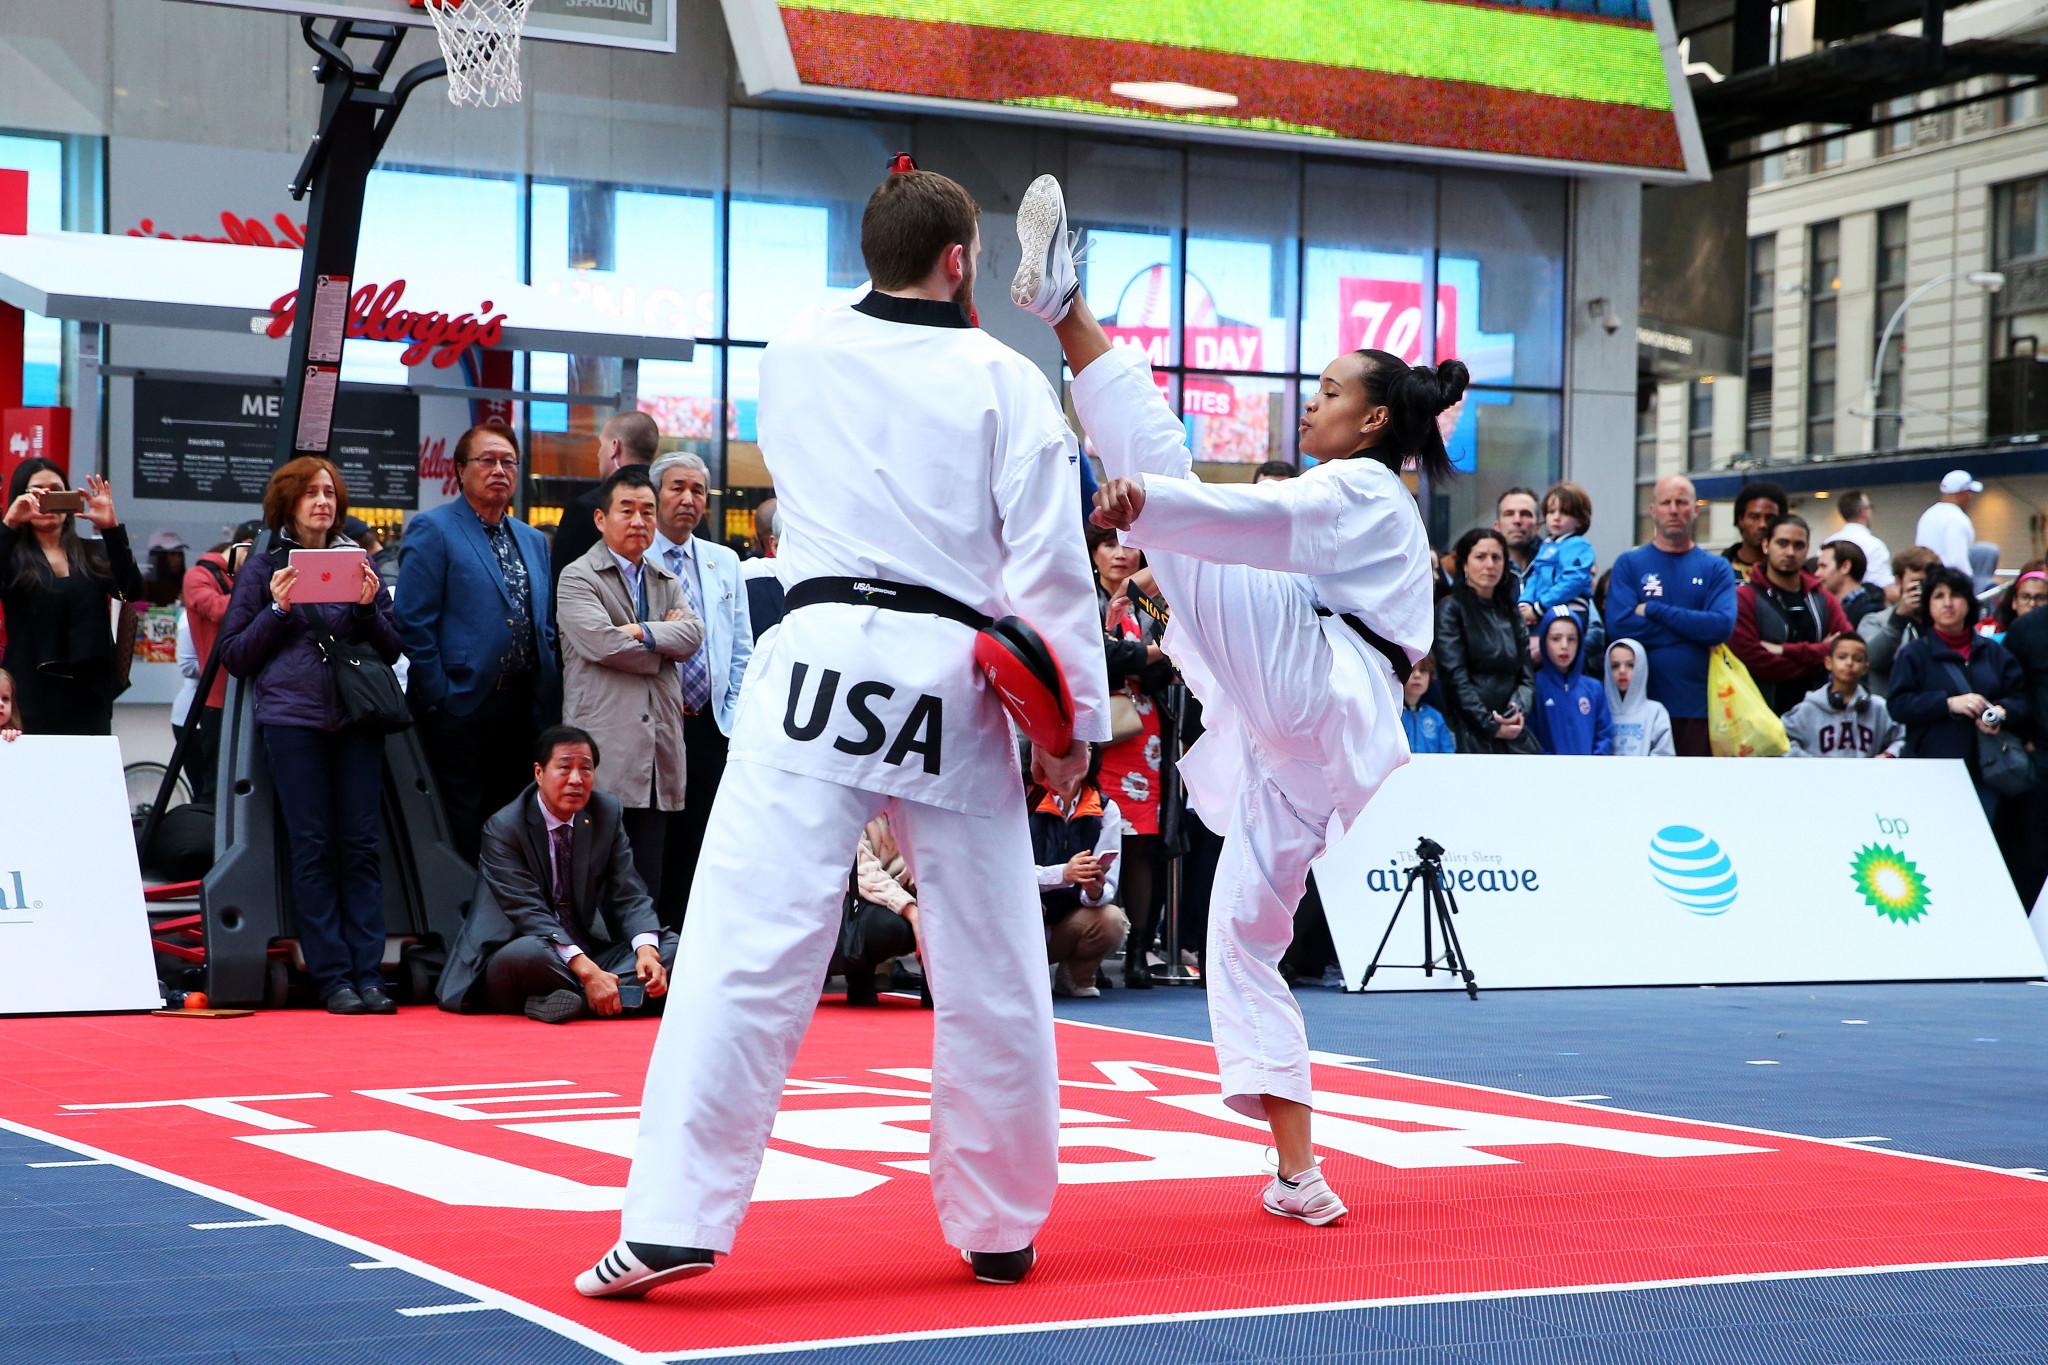 USA Taekwondo open application process for new regional coaches